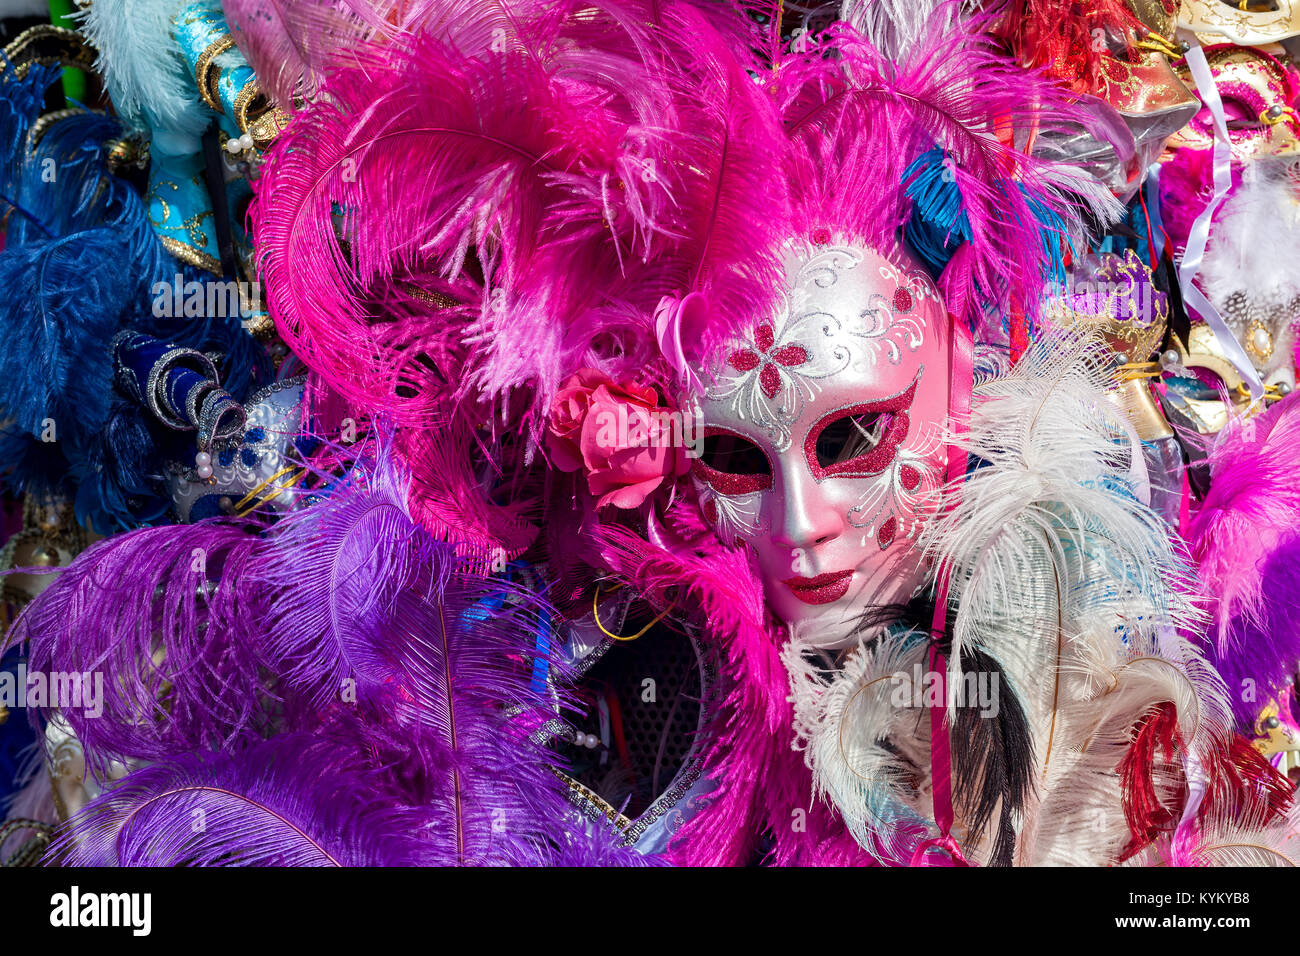 Ornati in maschera di Carnevale tra le piume colorate a Venezia, Italia. Immagini Stock